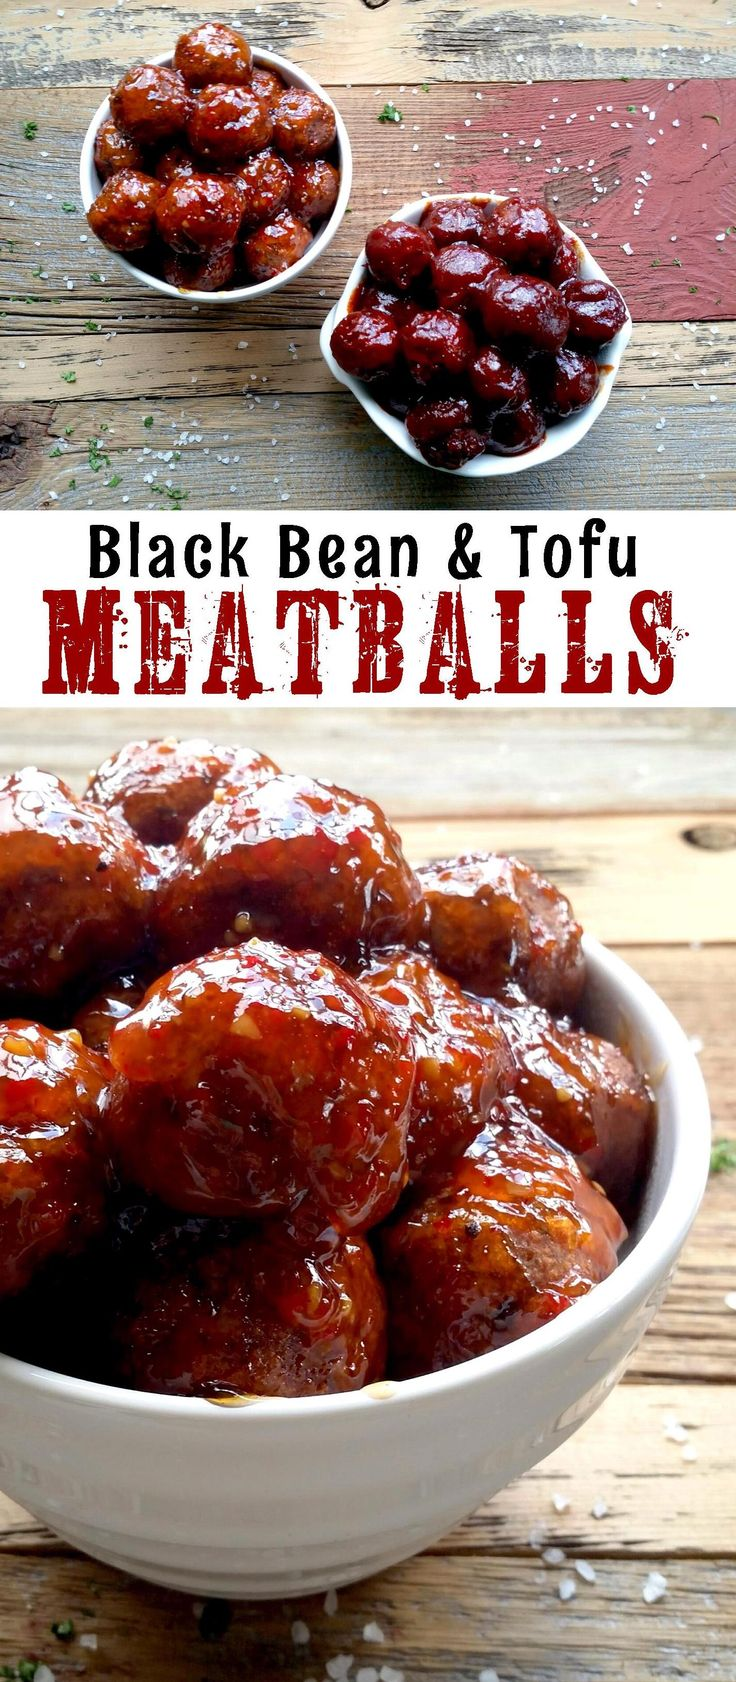 :: V e g a n & Vegetarian :: Black Bean and Tofu Meatballs #vegan #meatballs #crueltyfree